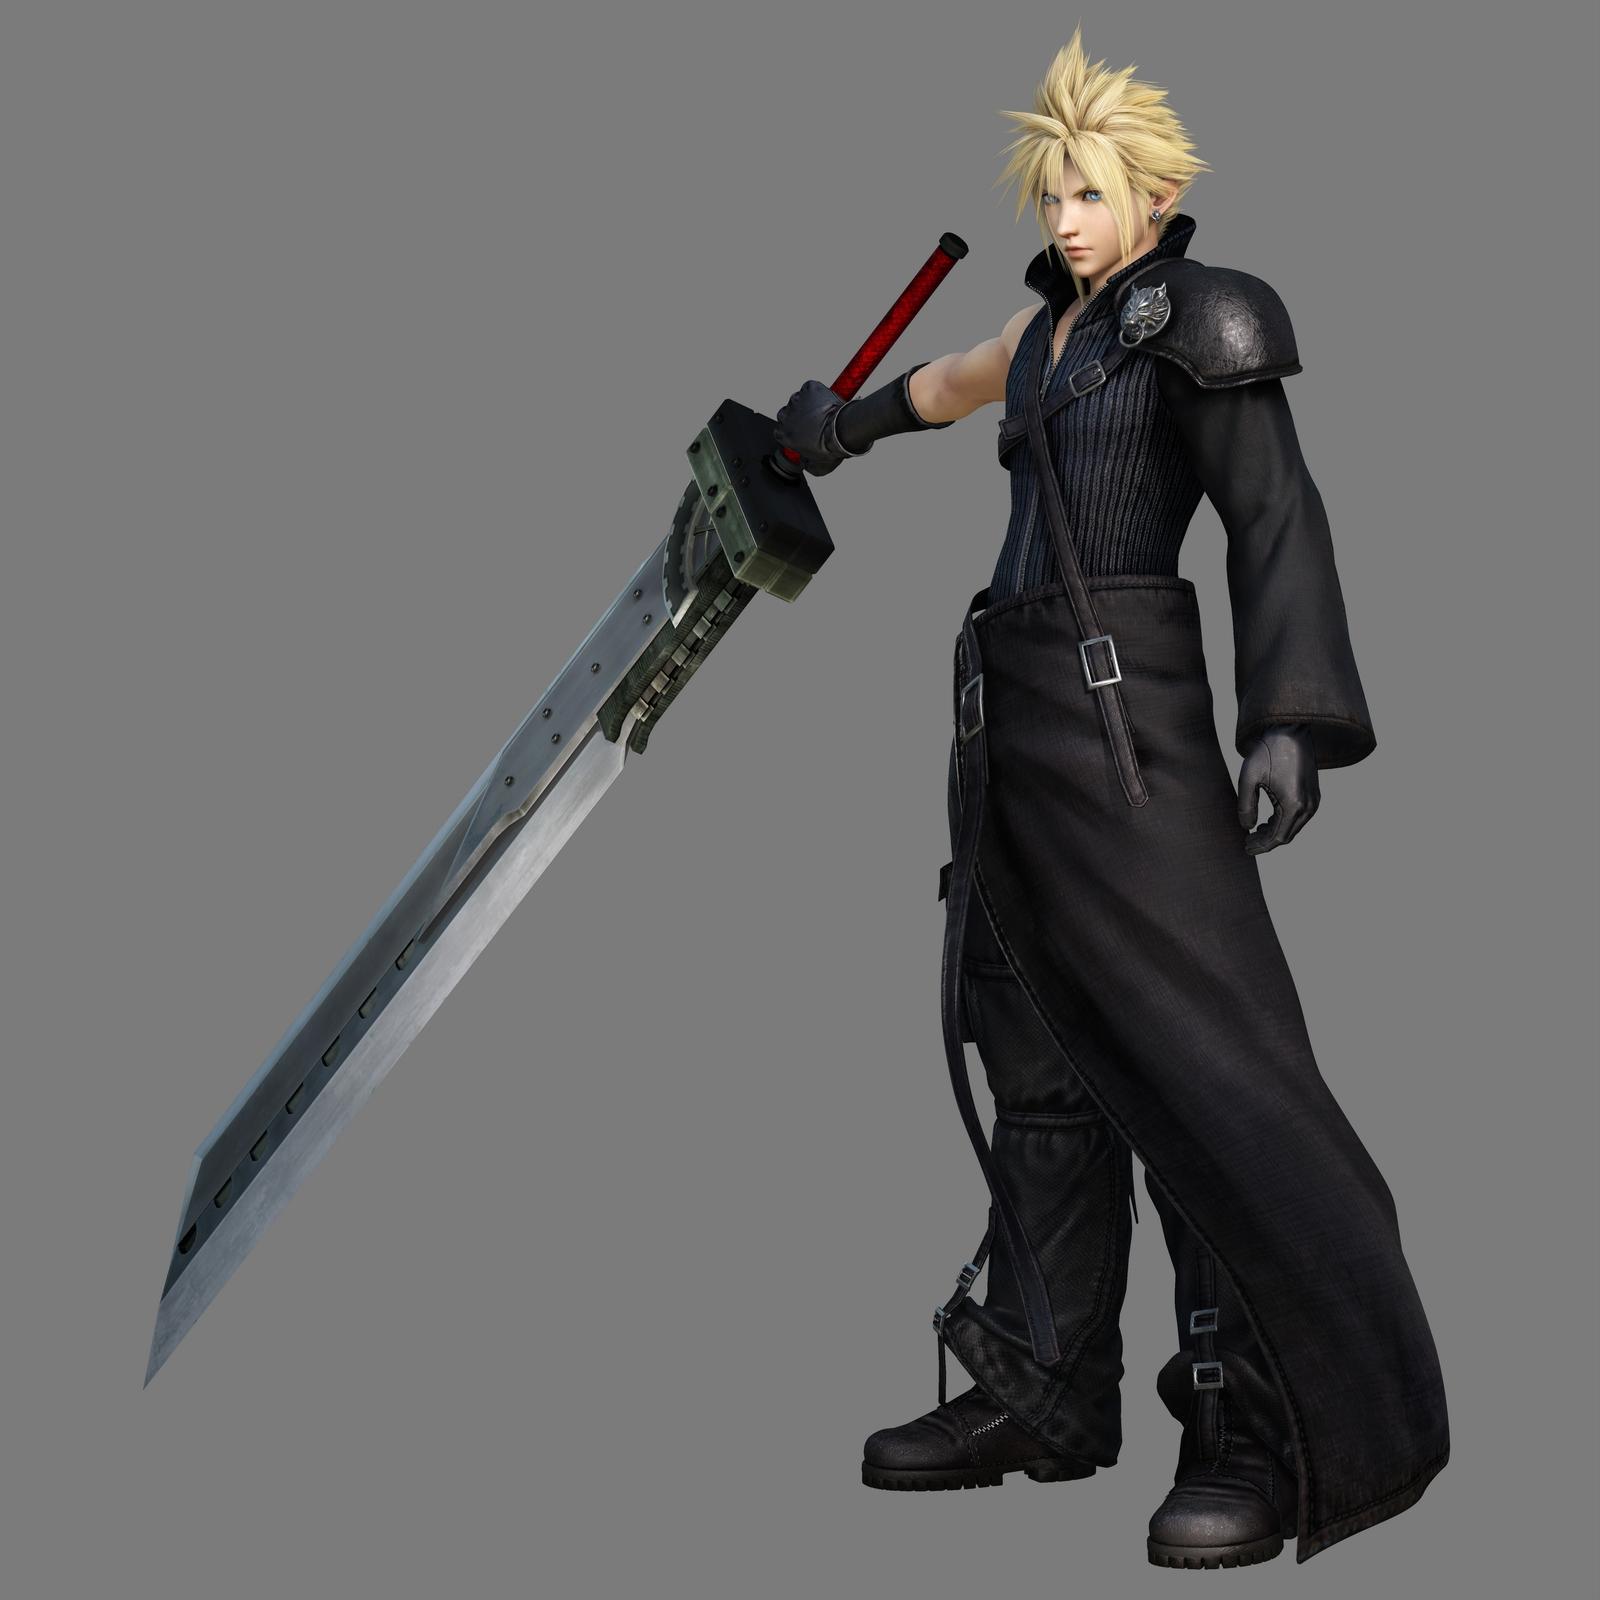 Cloud Strife Final Fantasy Vii Image 2231826 Zerochan